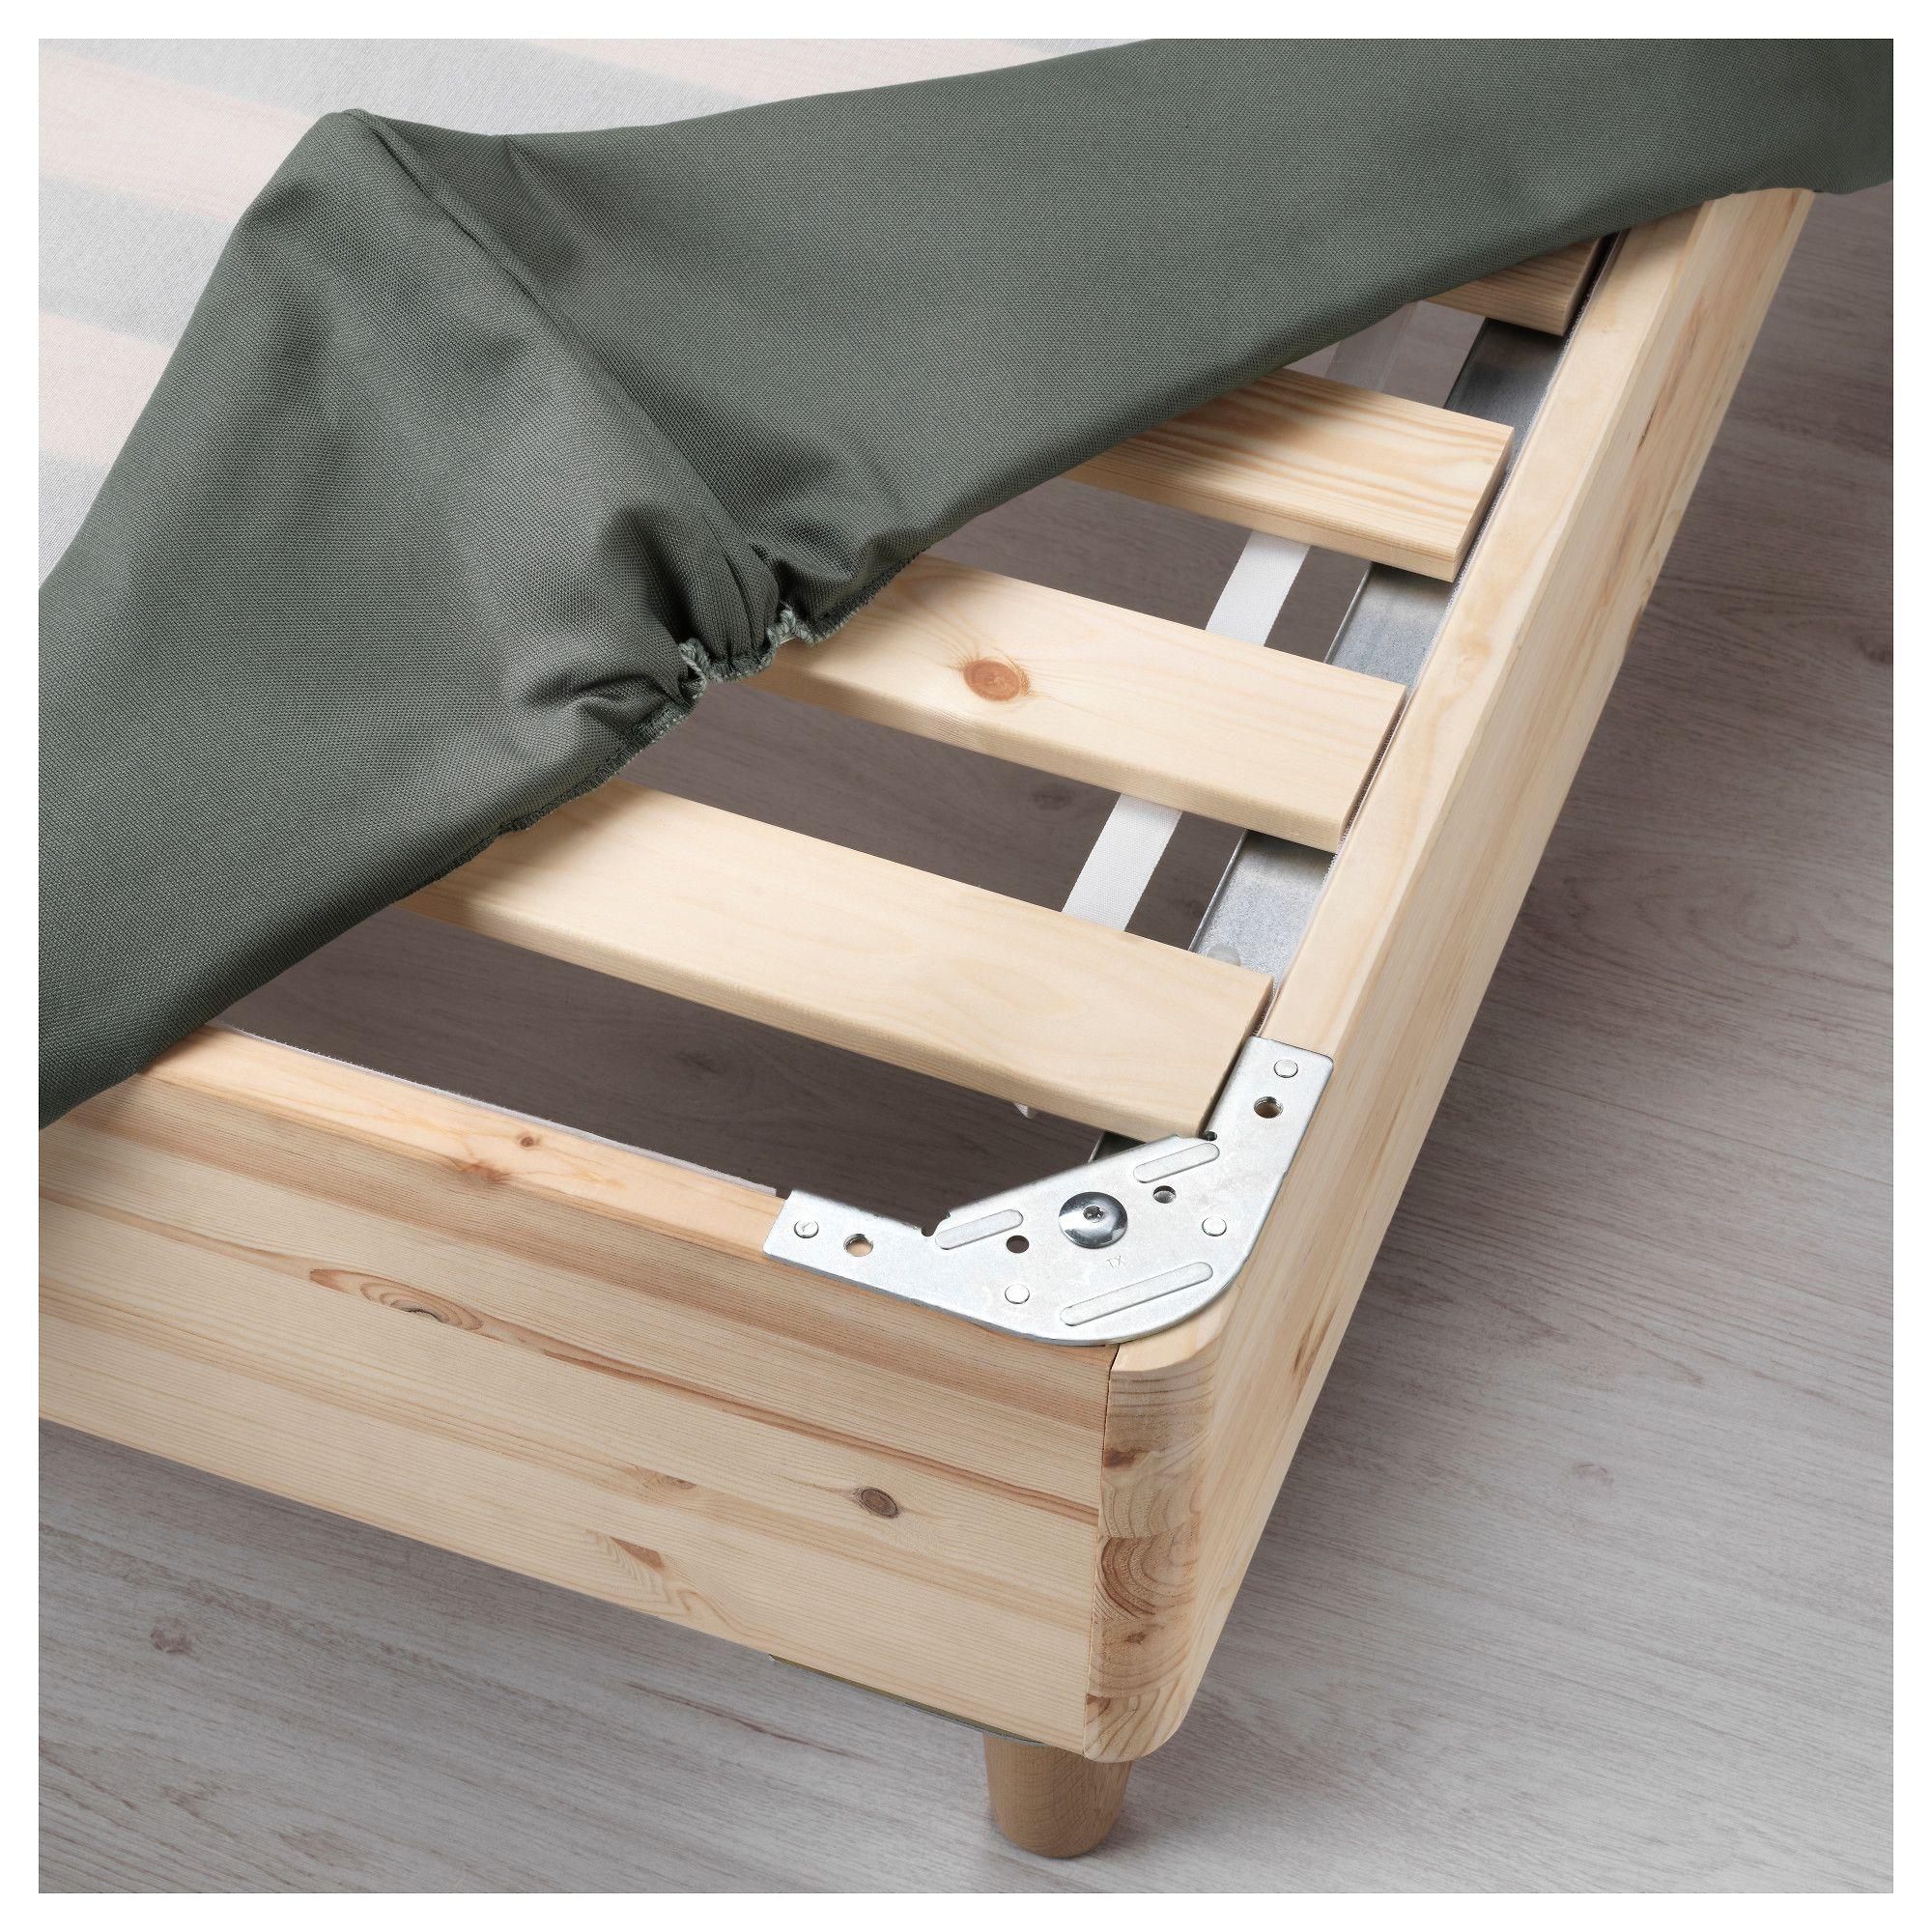 ikea espev r slatted mattress base with legs dark gray. Black Bedroom Furniture Sets. Home Design Ideas